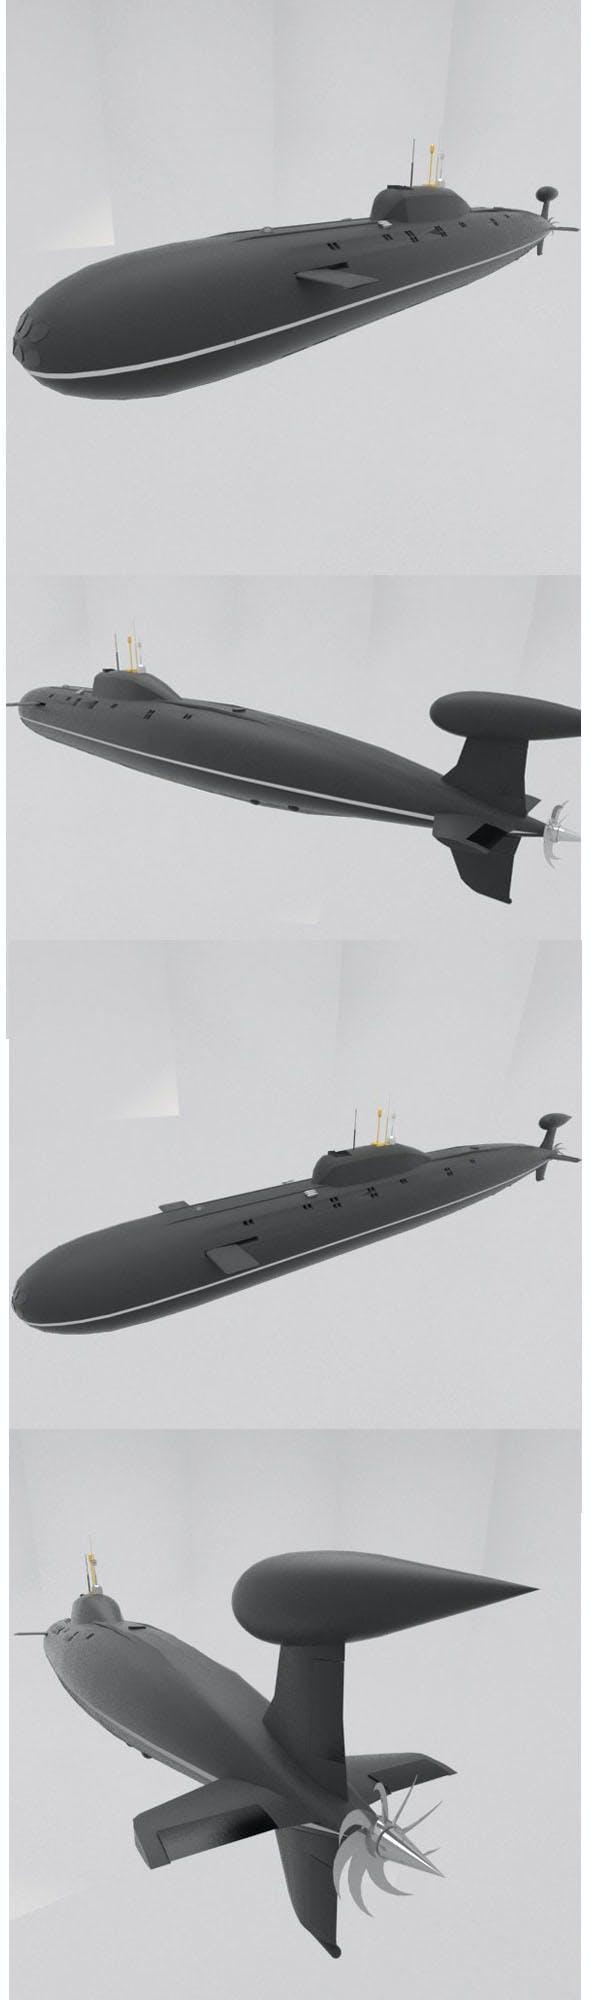 Akula Class Russian Submarine  - 3DOcean Item for Sale